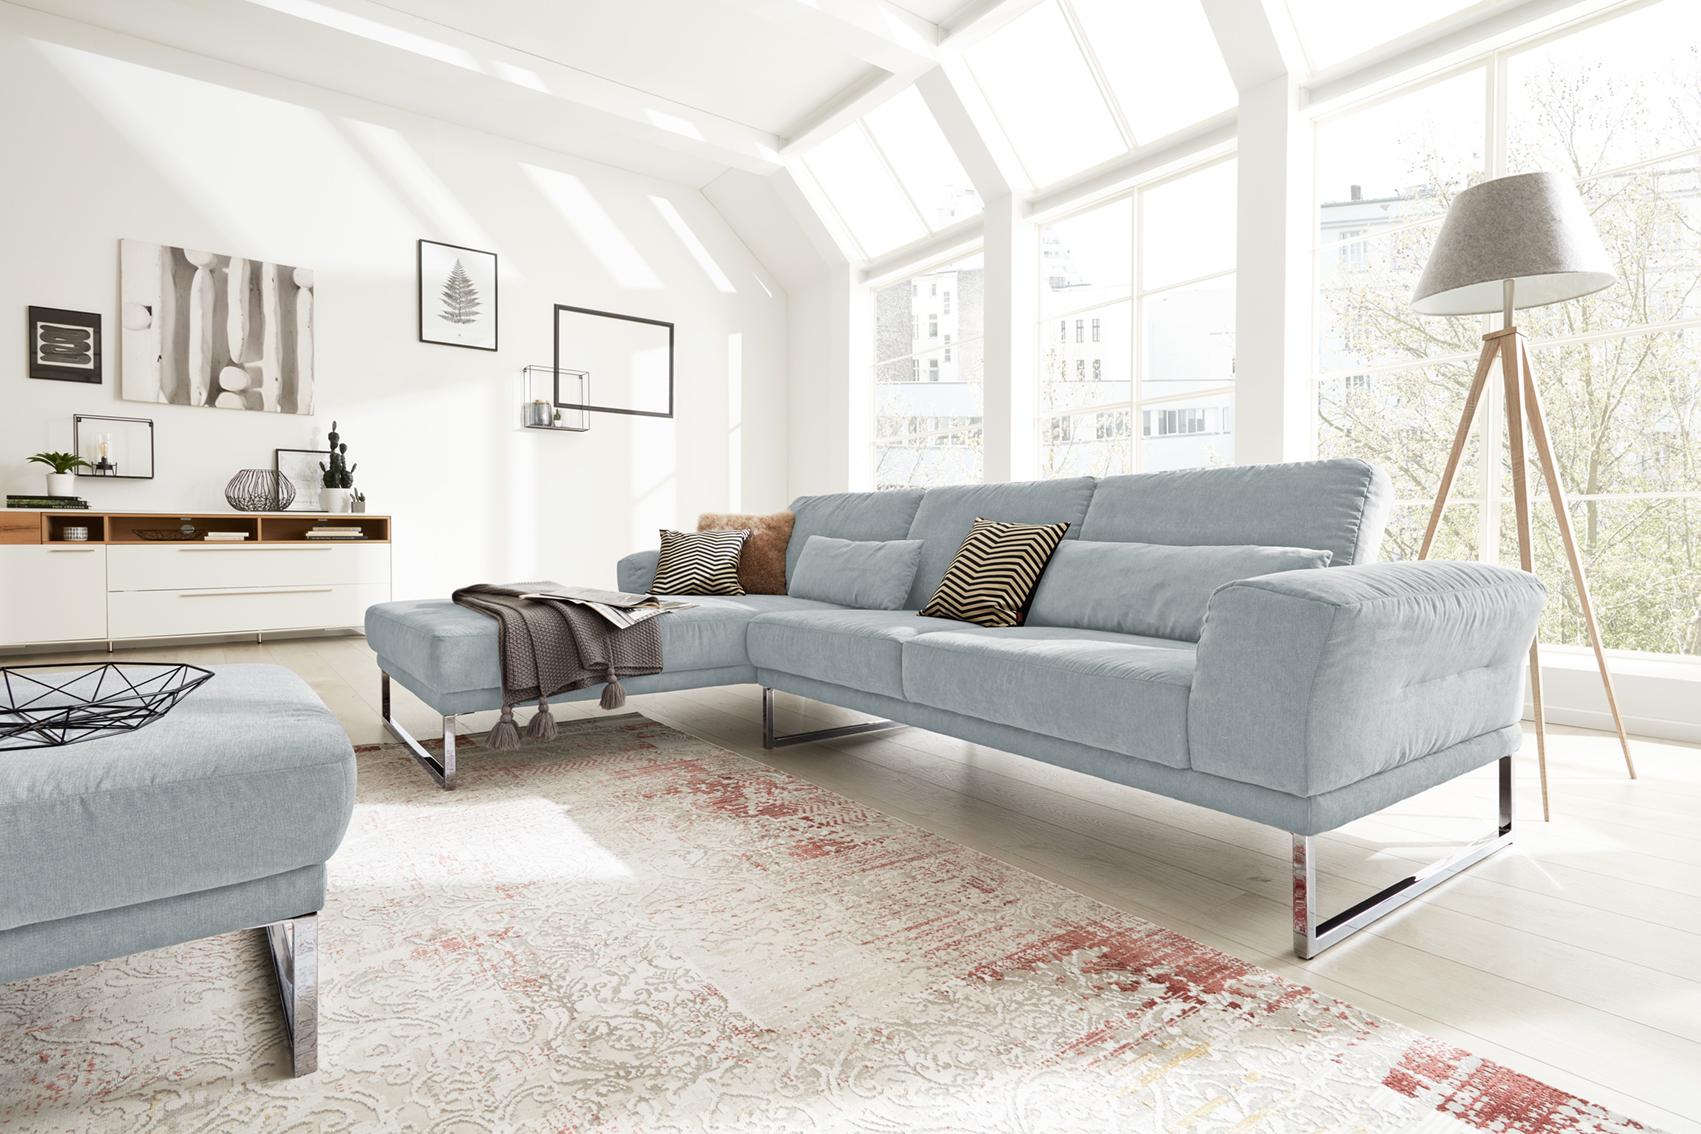 jobst-wohnwelt-Sofa-Serie-4102-Ecksofa-Matrix_light_blue